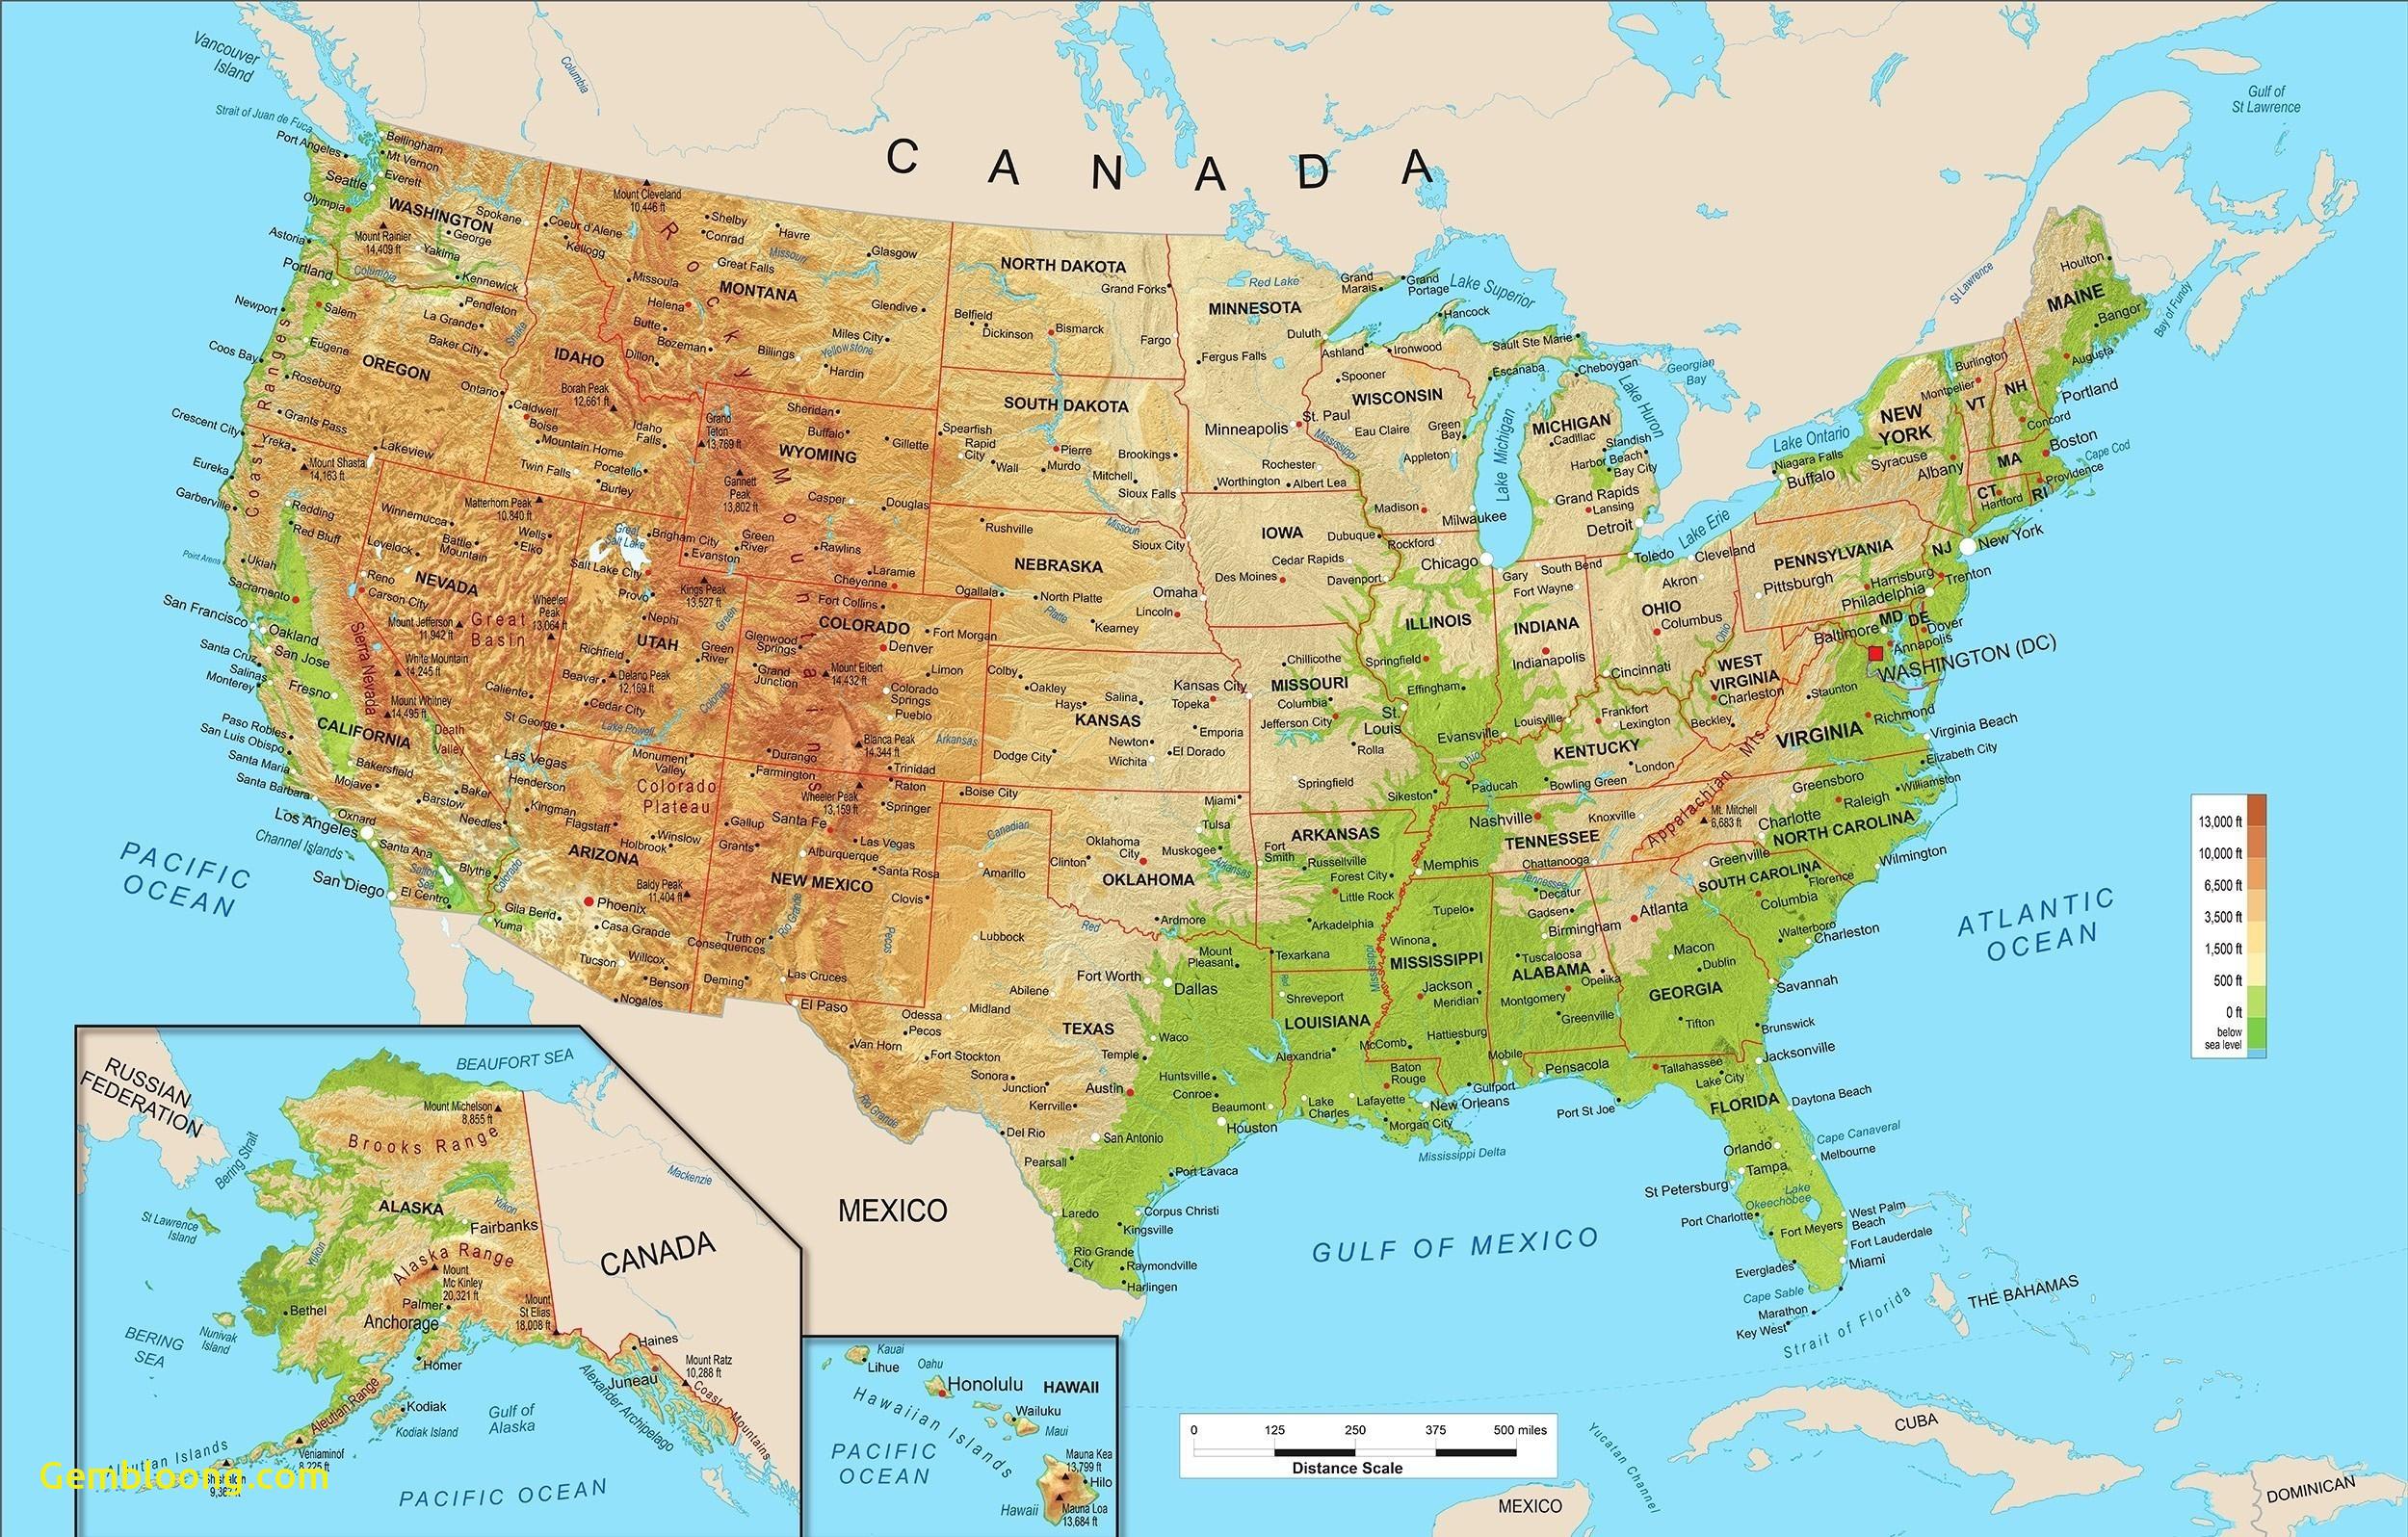 Red Bluff California Mapweb Image Galleryunited States Map Labeled - Red Bluff California Map